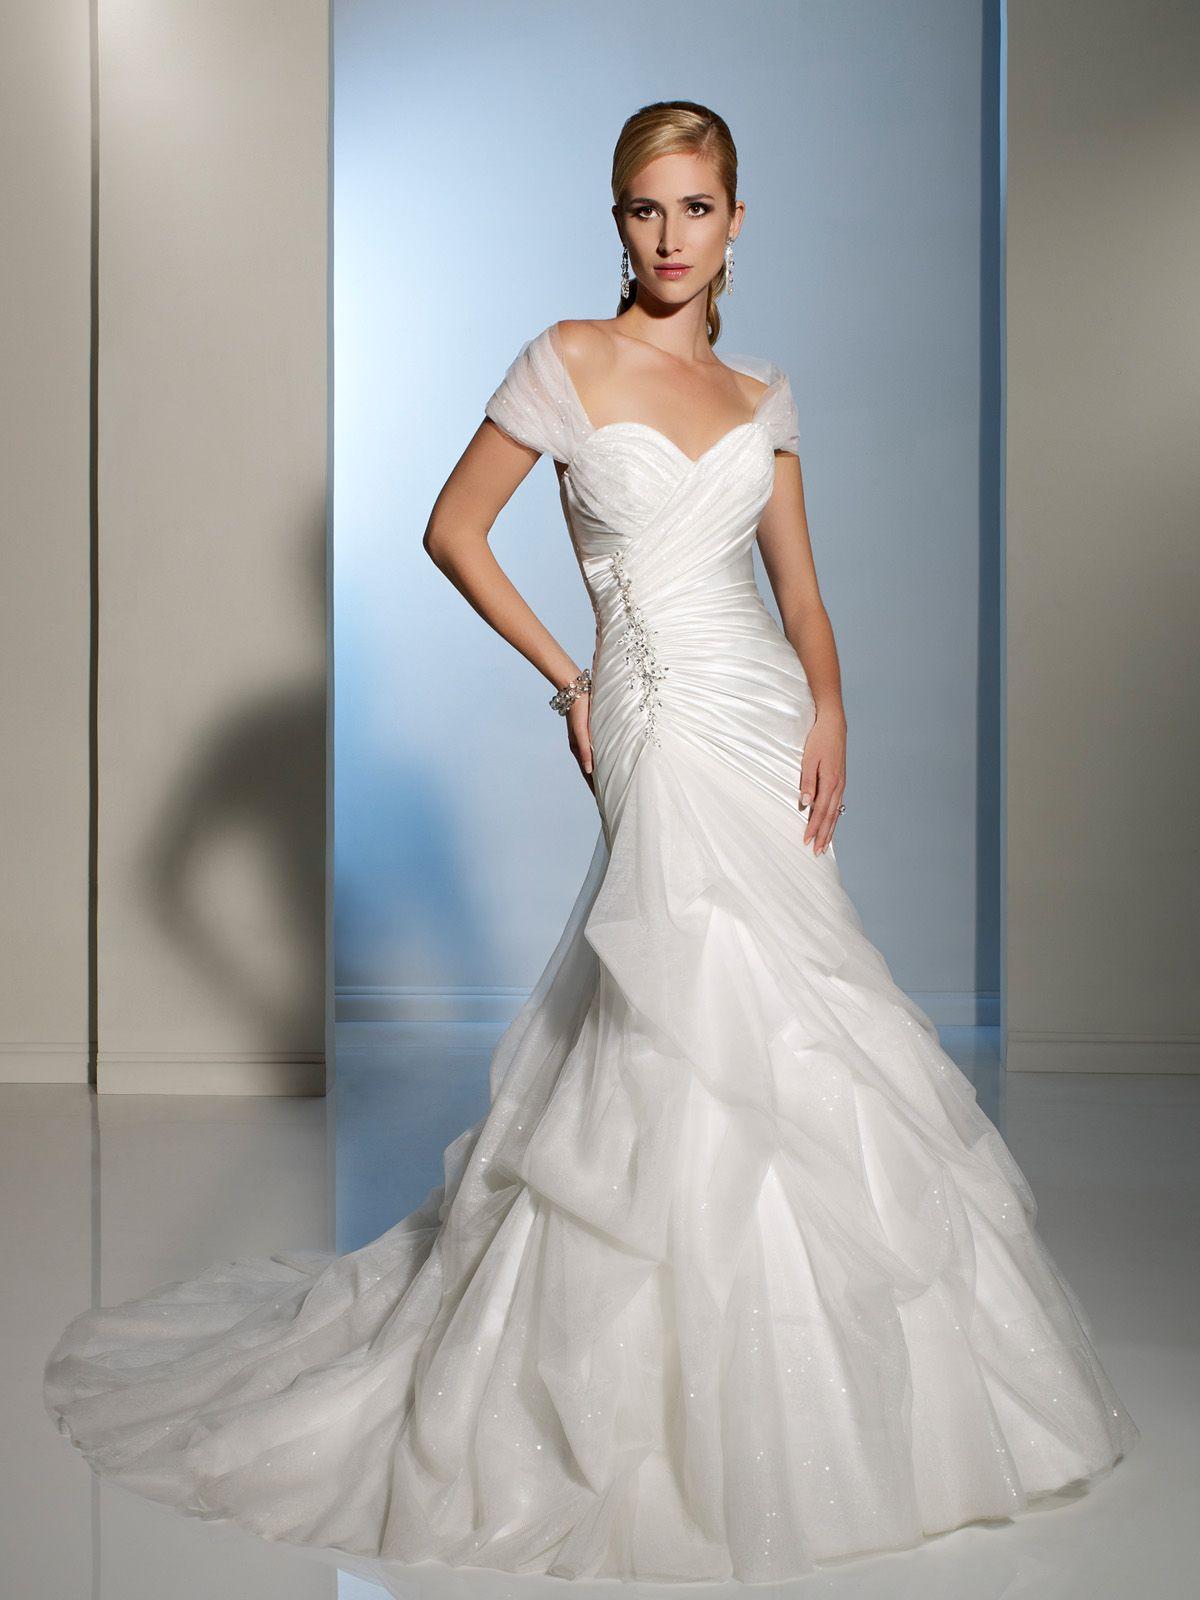 Beautifully designed aline wedding dress with detachable